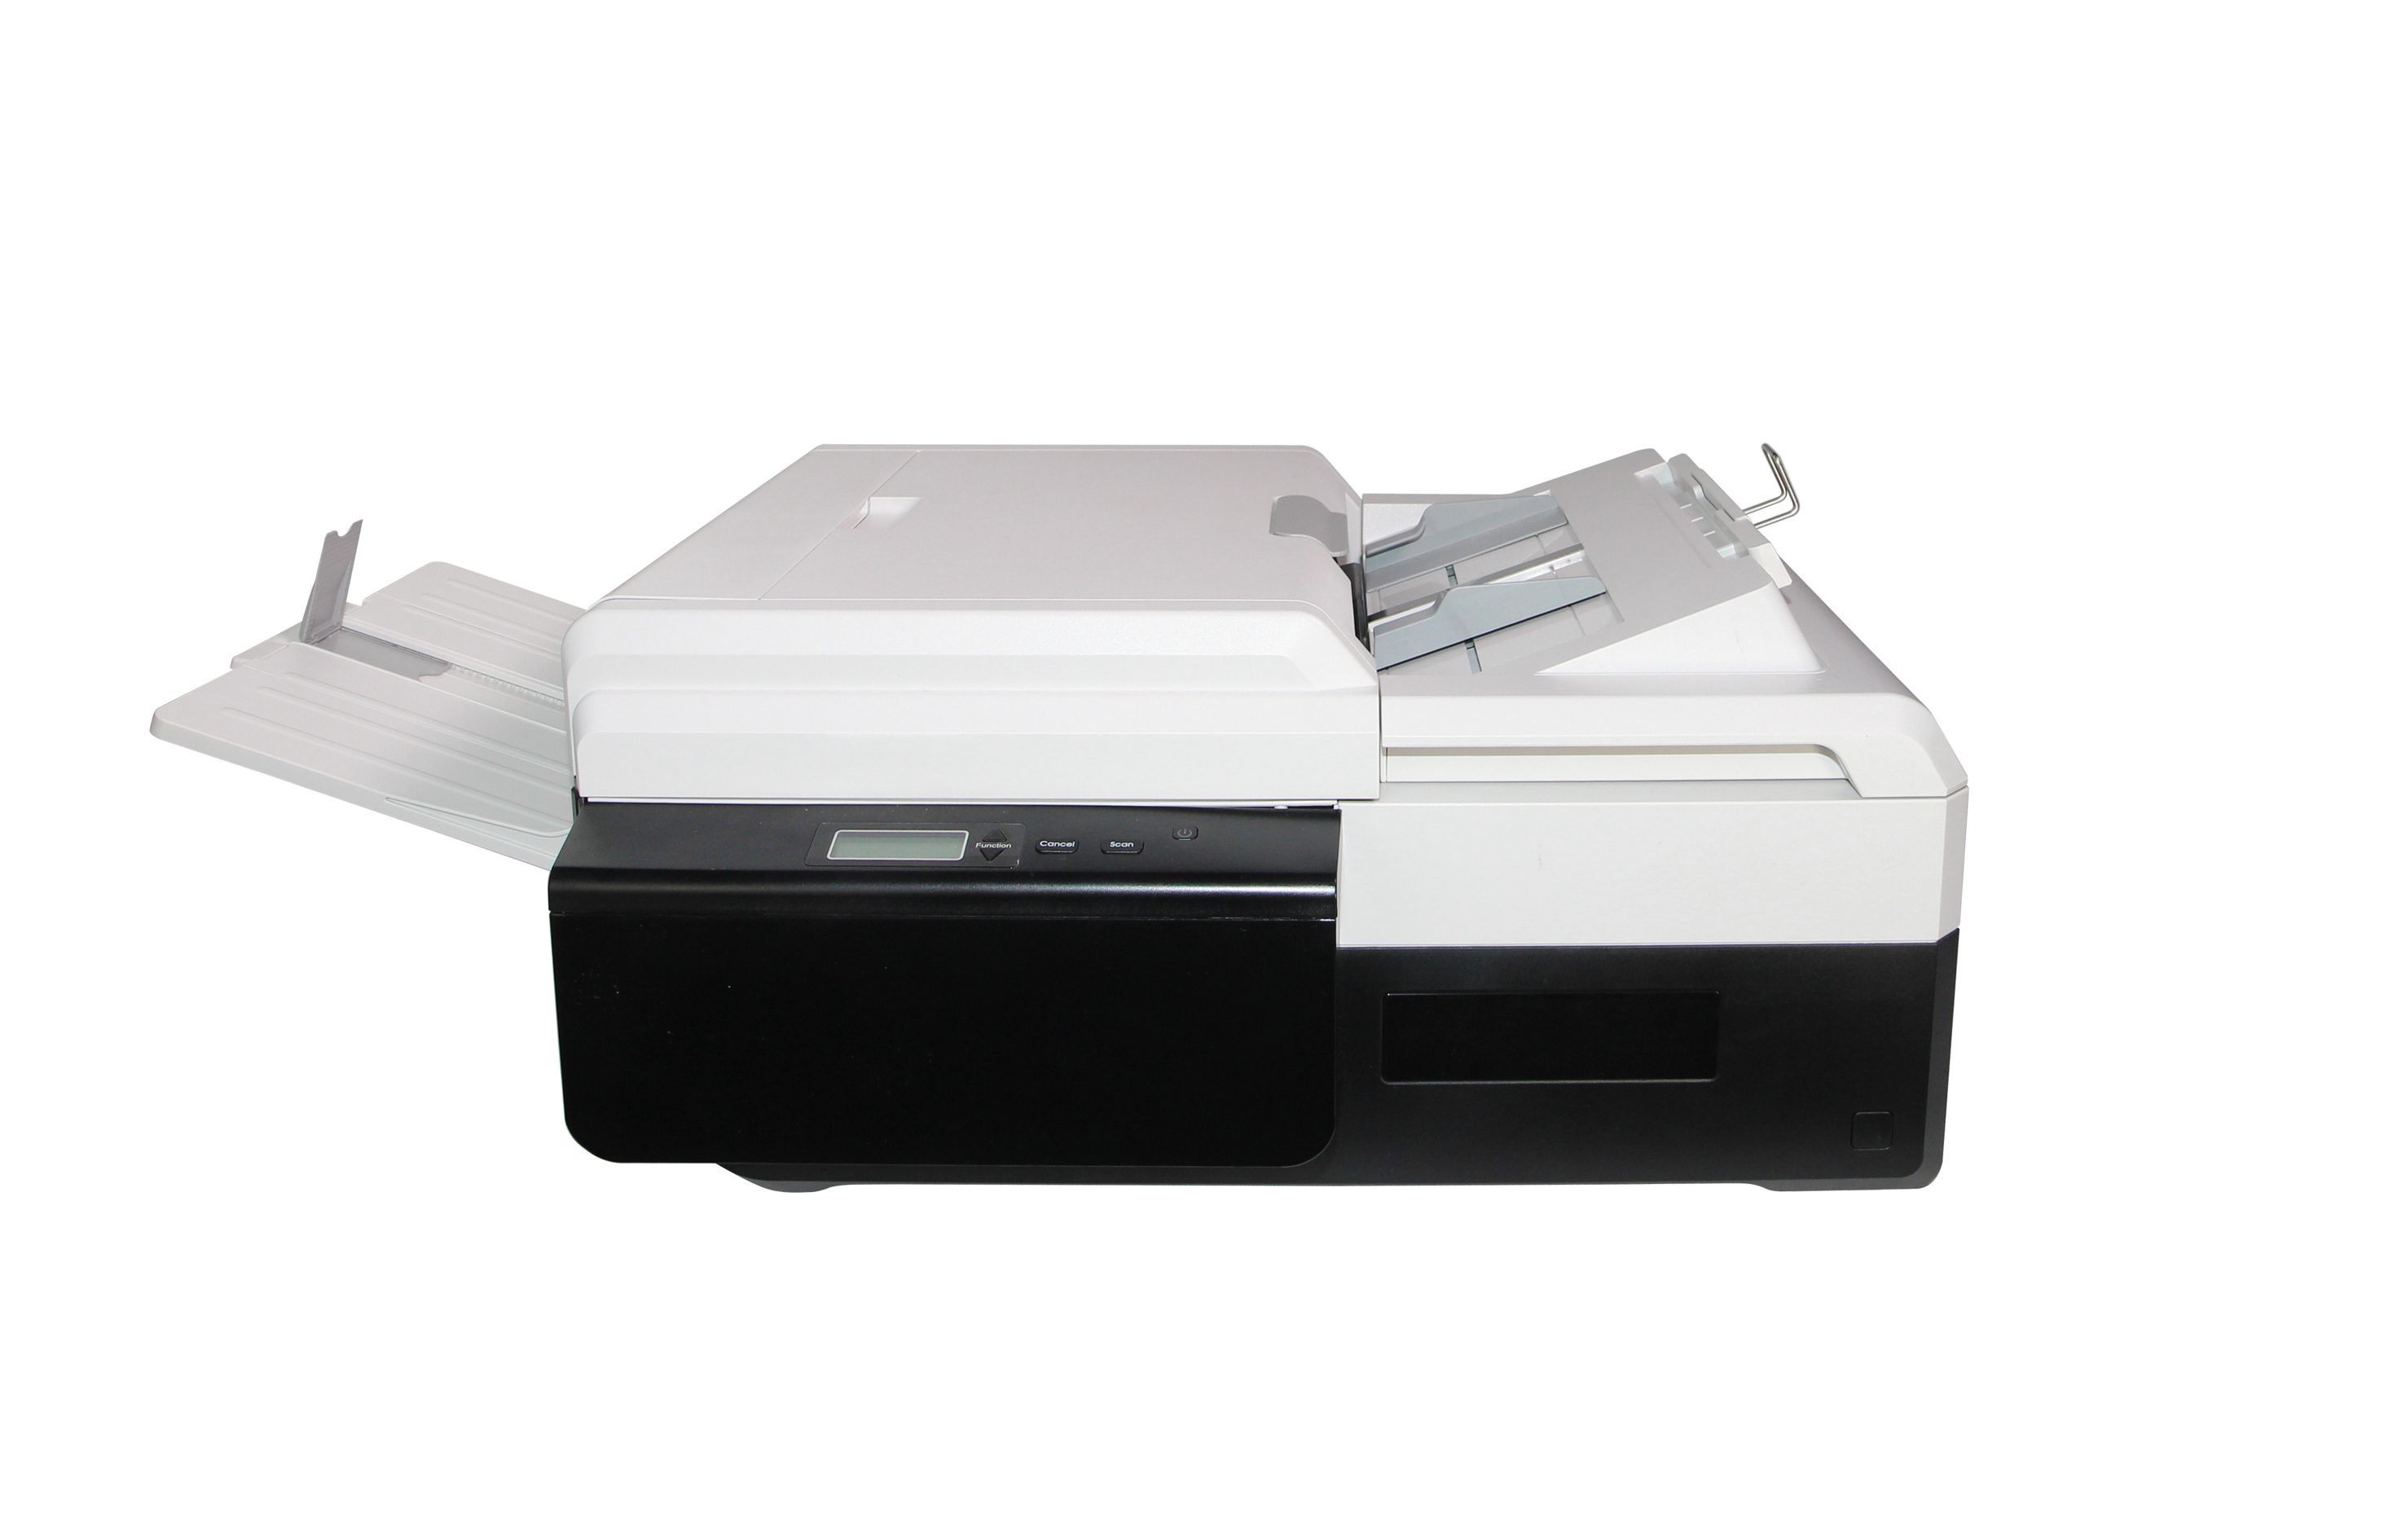 Avision AD7080 - 310 x 432 mm - 100 Seiten pro Minute - 48 Bit - 24 Bit - 16 Bit - 8 Bit